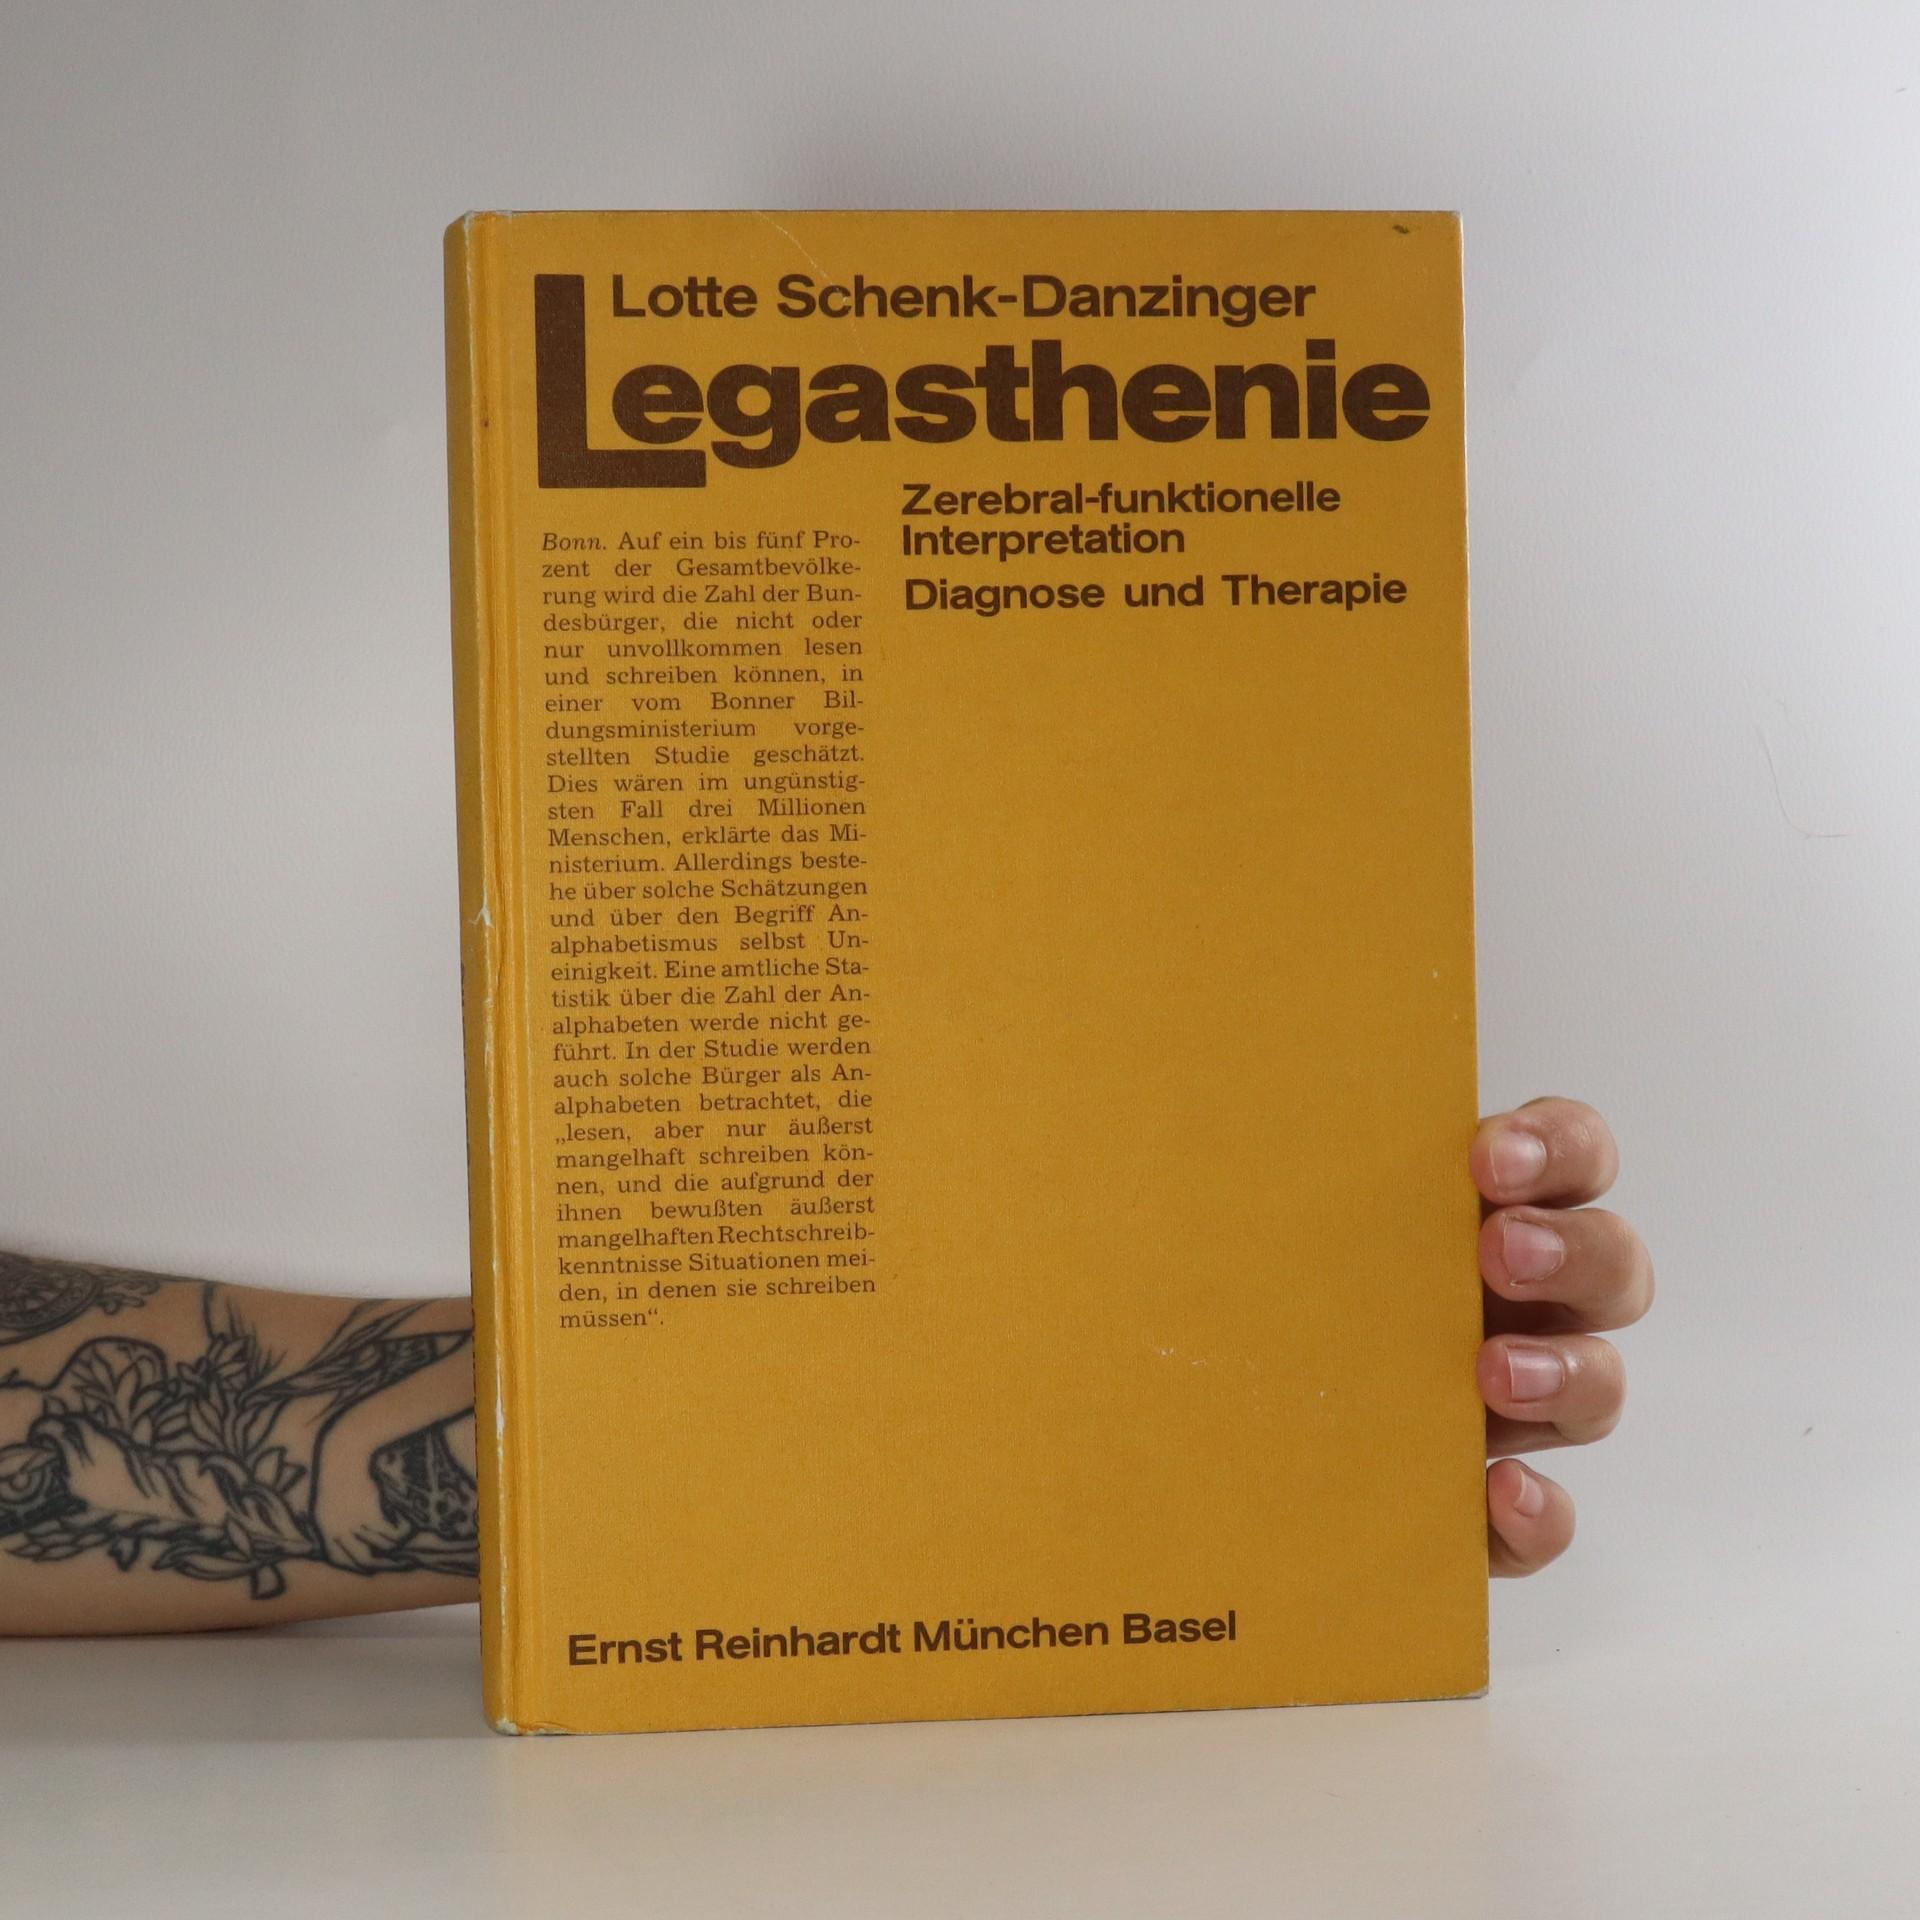 antikvární kniha Legasthenie. Zerebral-funktionelle Interpretation, 1991